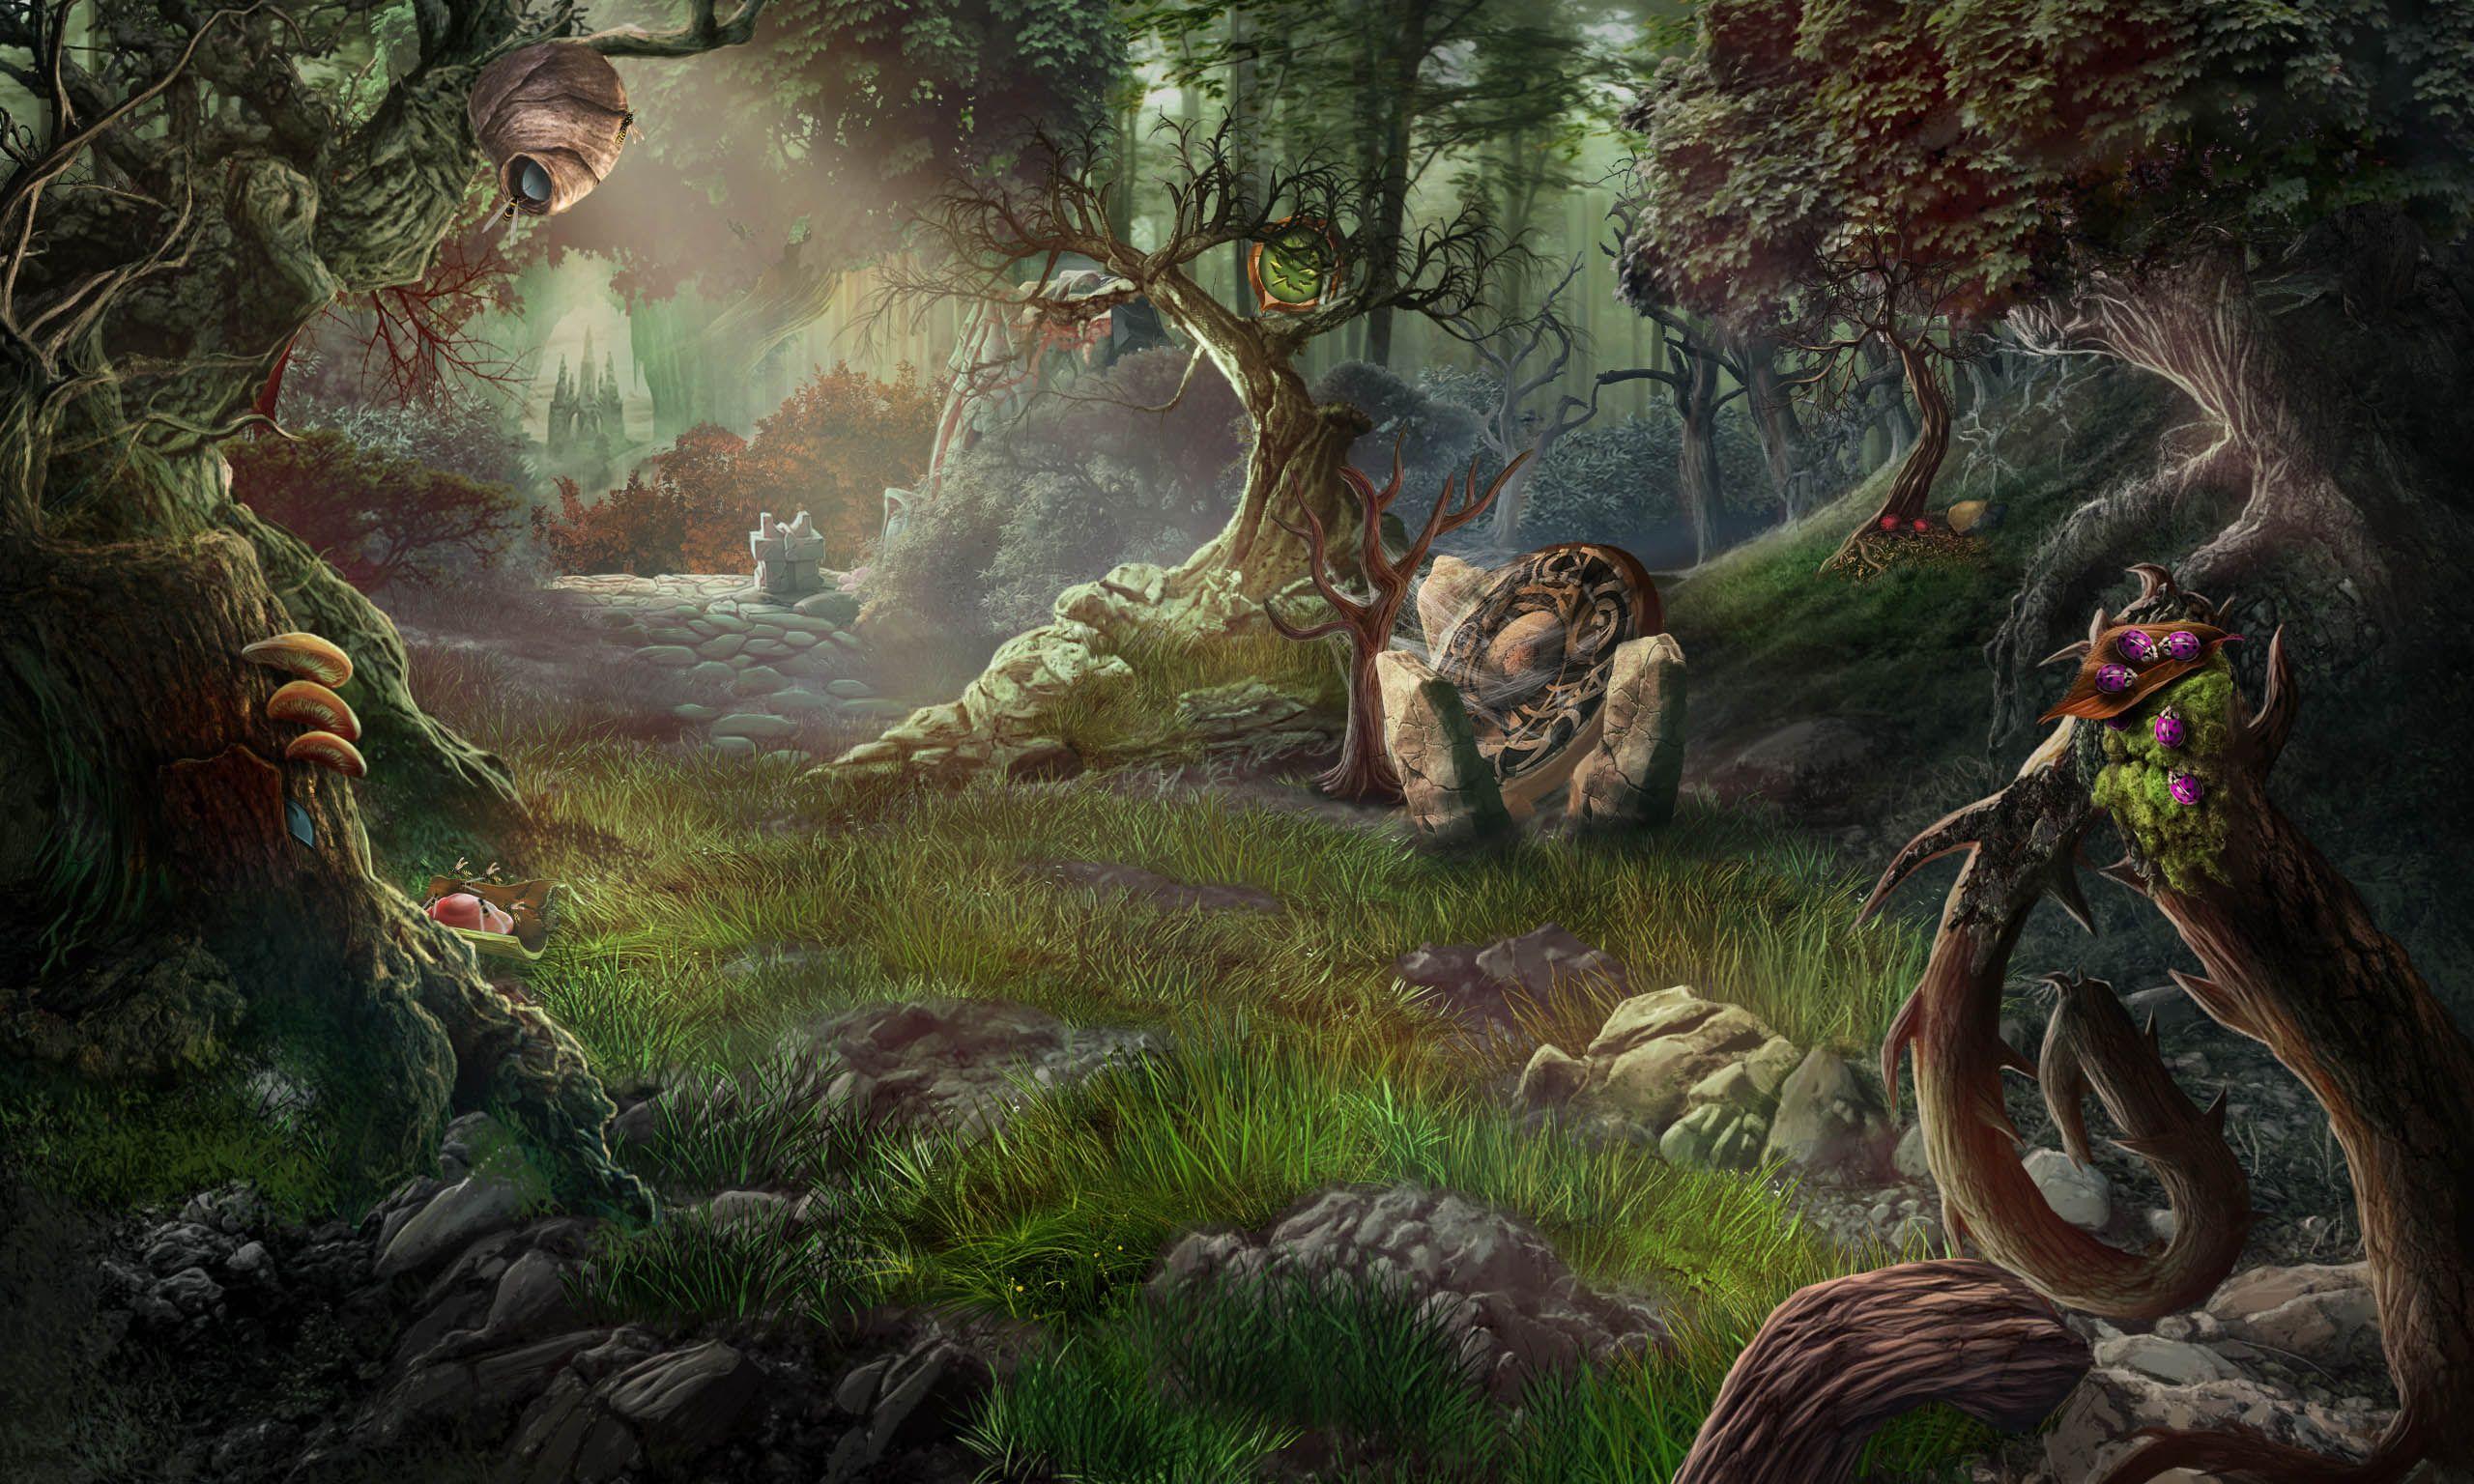 #forest #way #rocks #rock #snail #tree #wierd #wild #art #gamedev #gameart #gamedevelopmentart #gaming #game #madheadgames